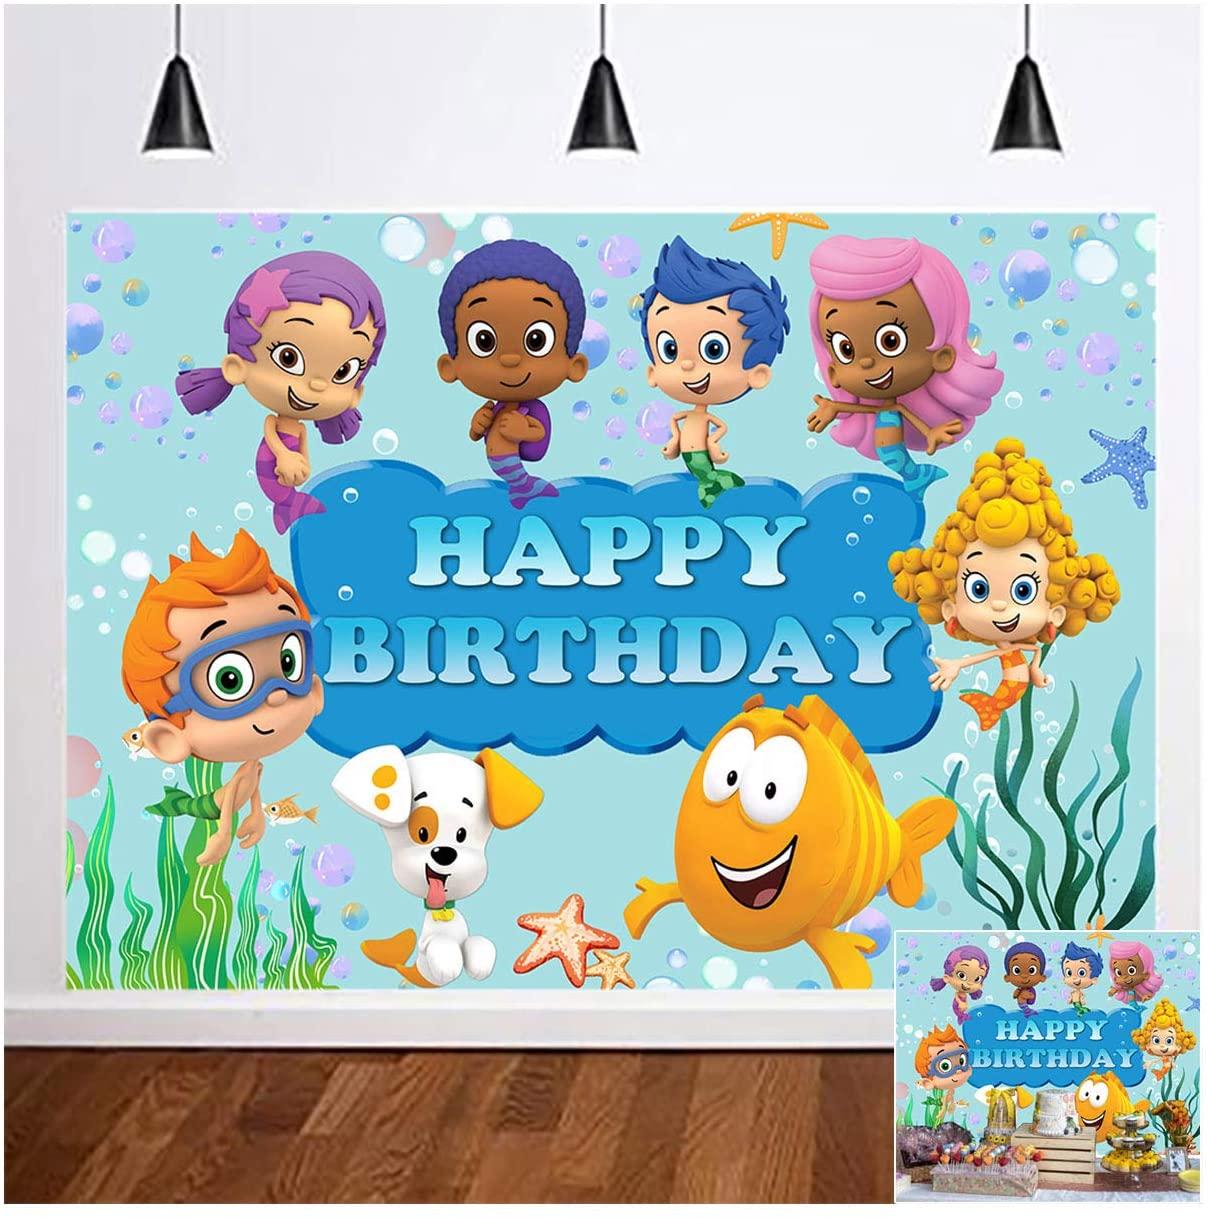 Cartoon Bubble Guppies Happy Birthday Theme Photo Background 5x3ft Vinyl Ocean Under Kids Boys Princess Girl Birthday Party Photography Backdrops Newborn Baby Shower Dessert Cake Table Decor Supplies